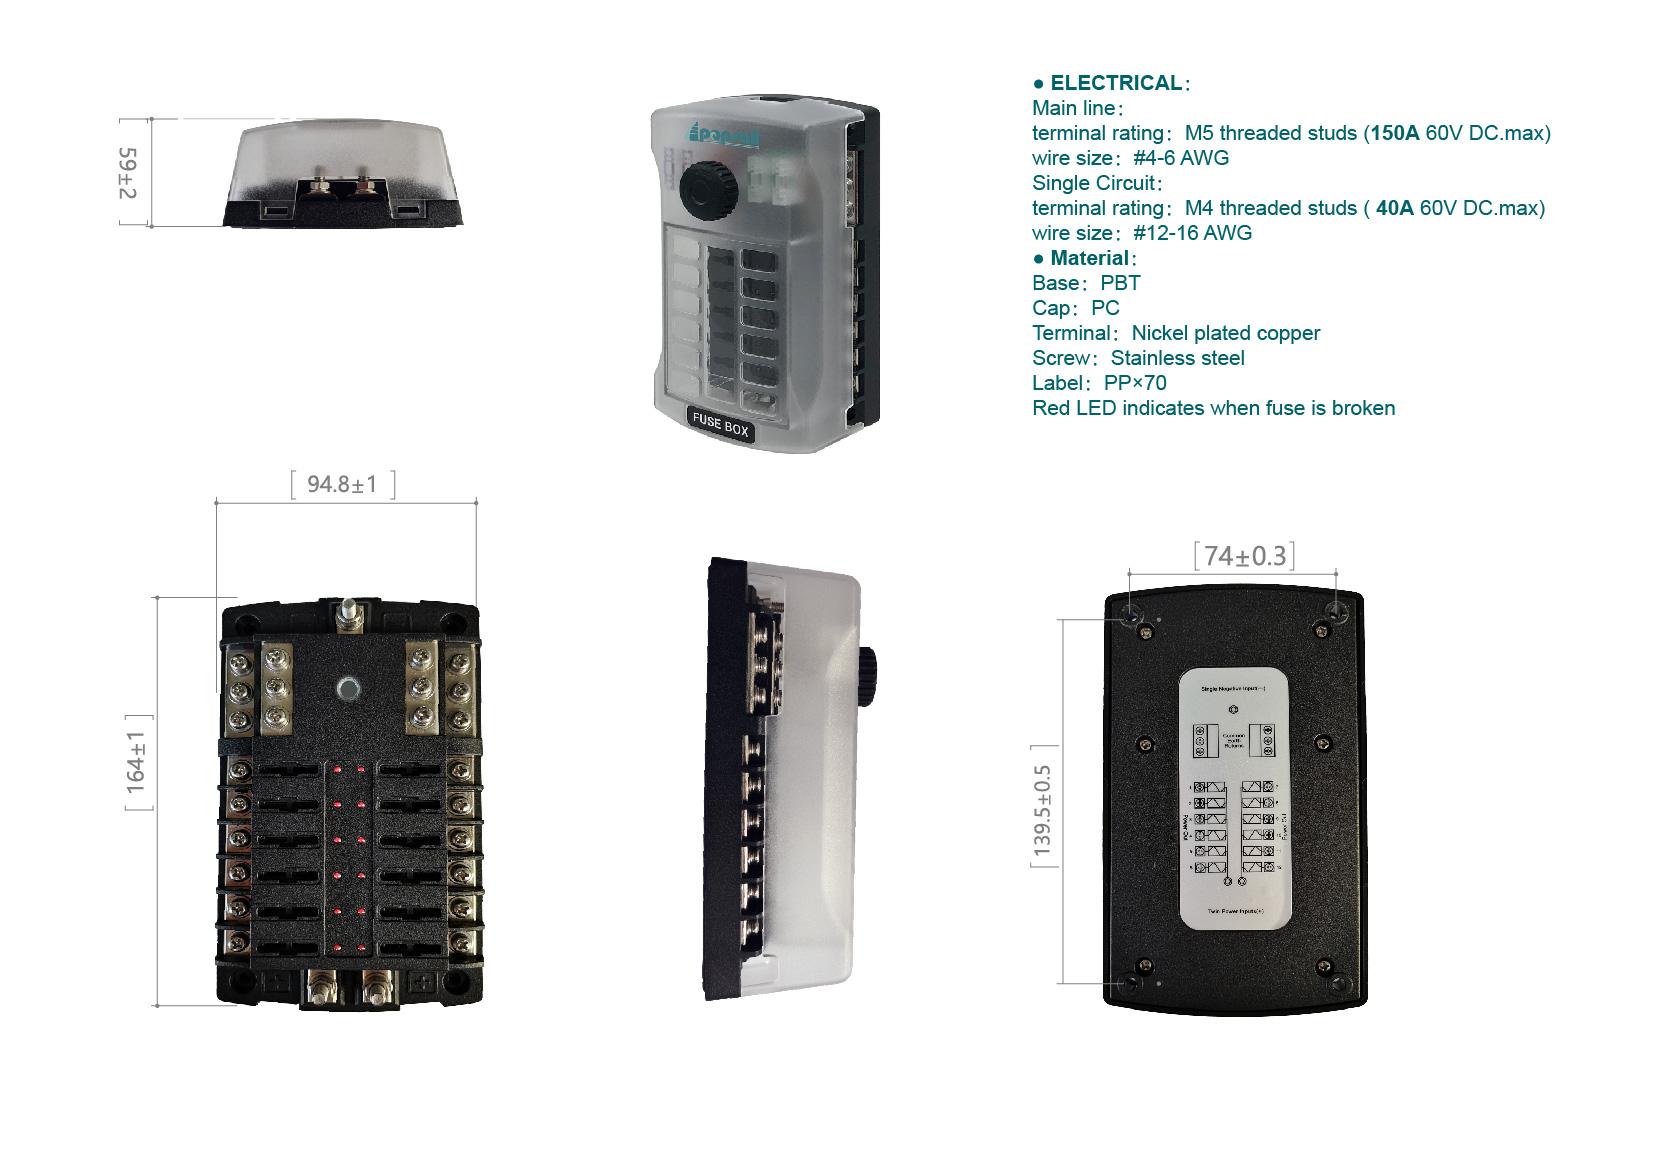 fuse holder box 150A